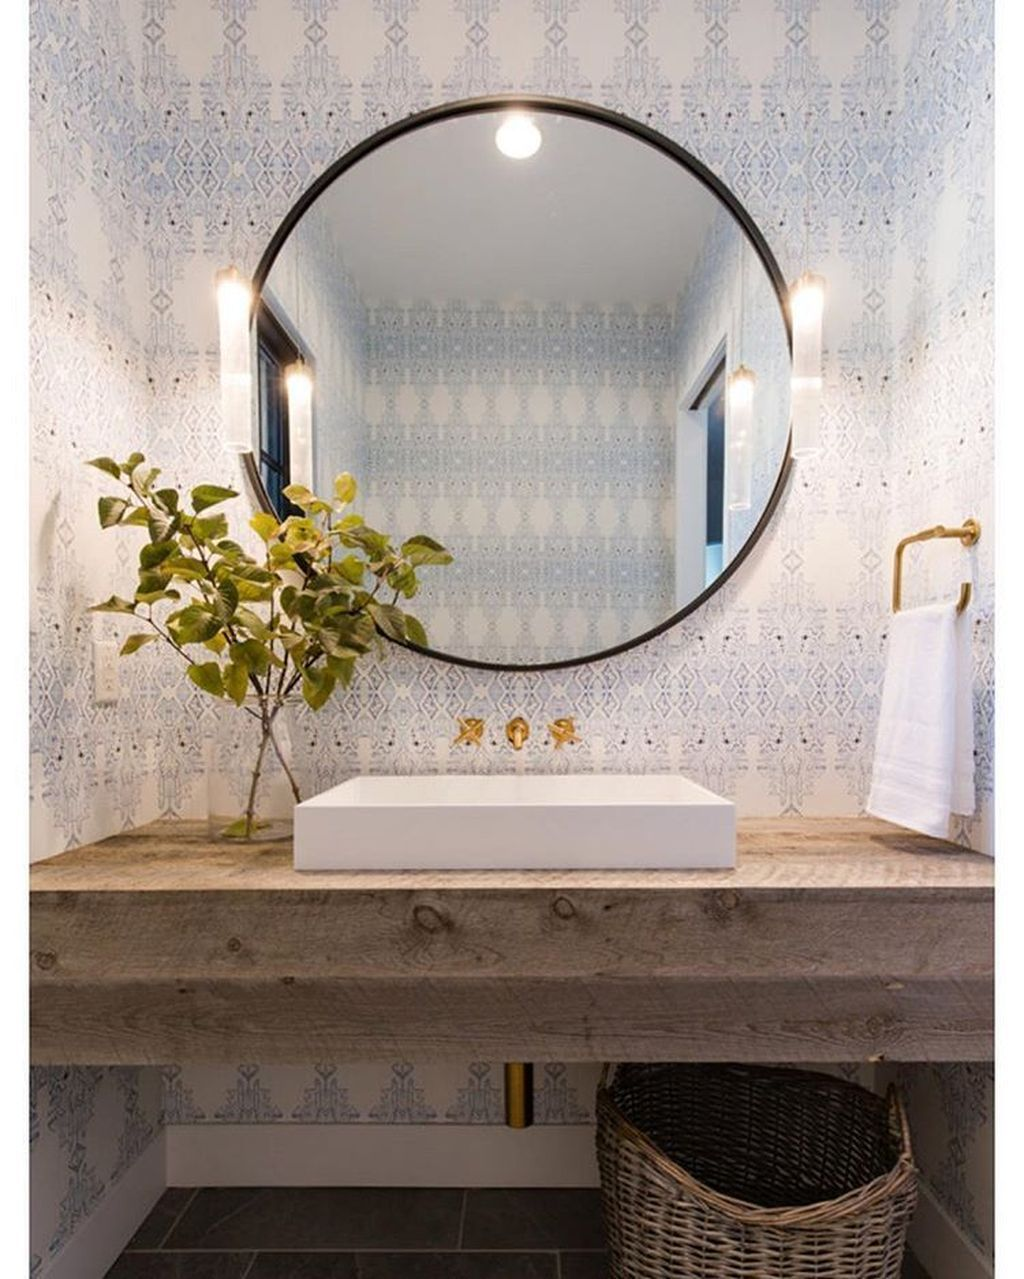 30 Inspiring Small Powder Room Decor And Design Ideas Modernpowderrooms Banyo Duvar Kagidi Banyo Dekorasyonu Makyaj Odasi